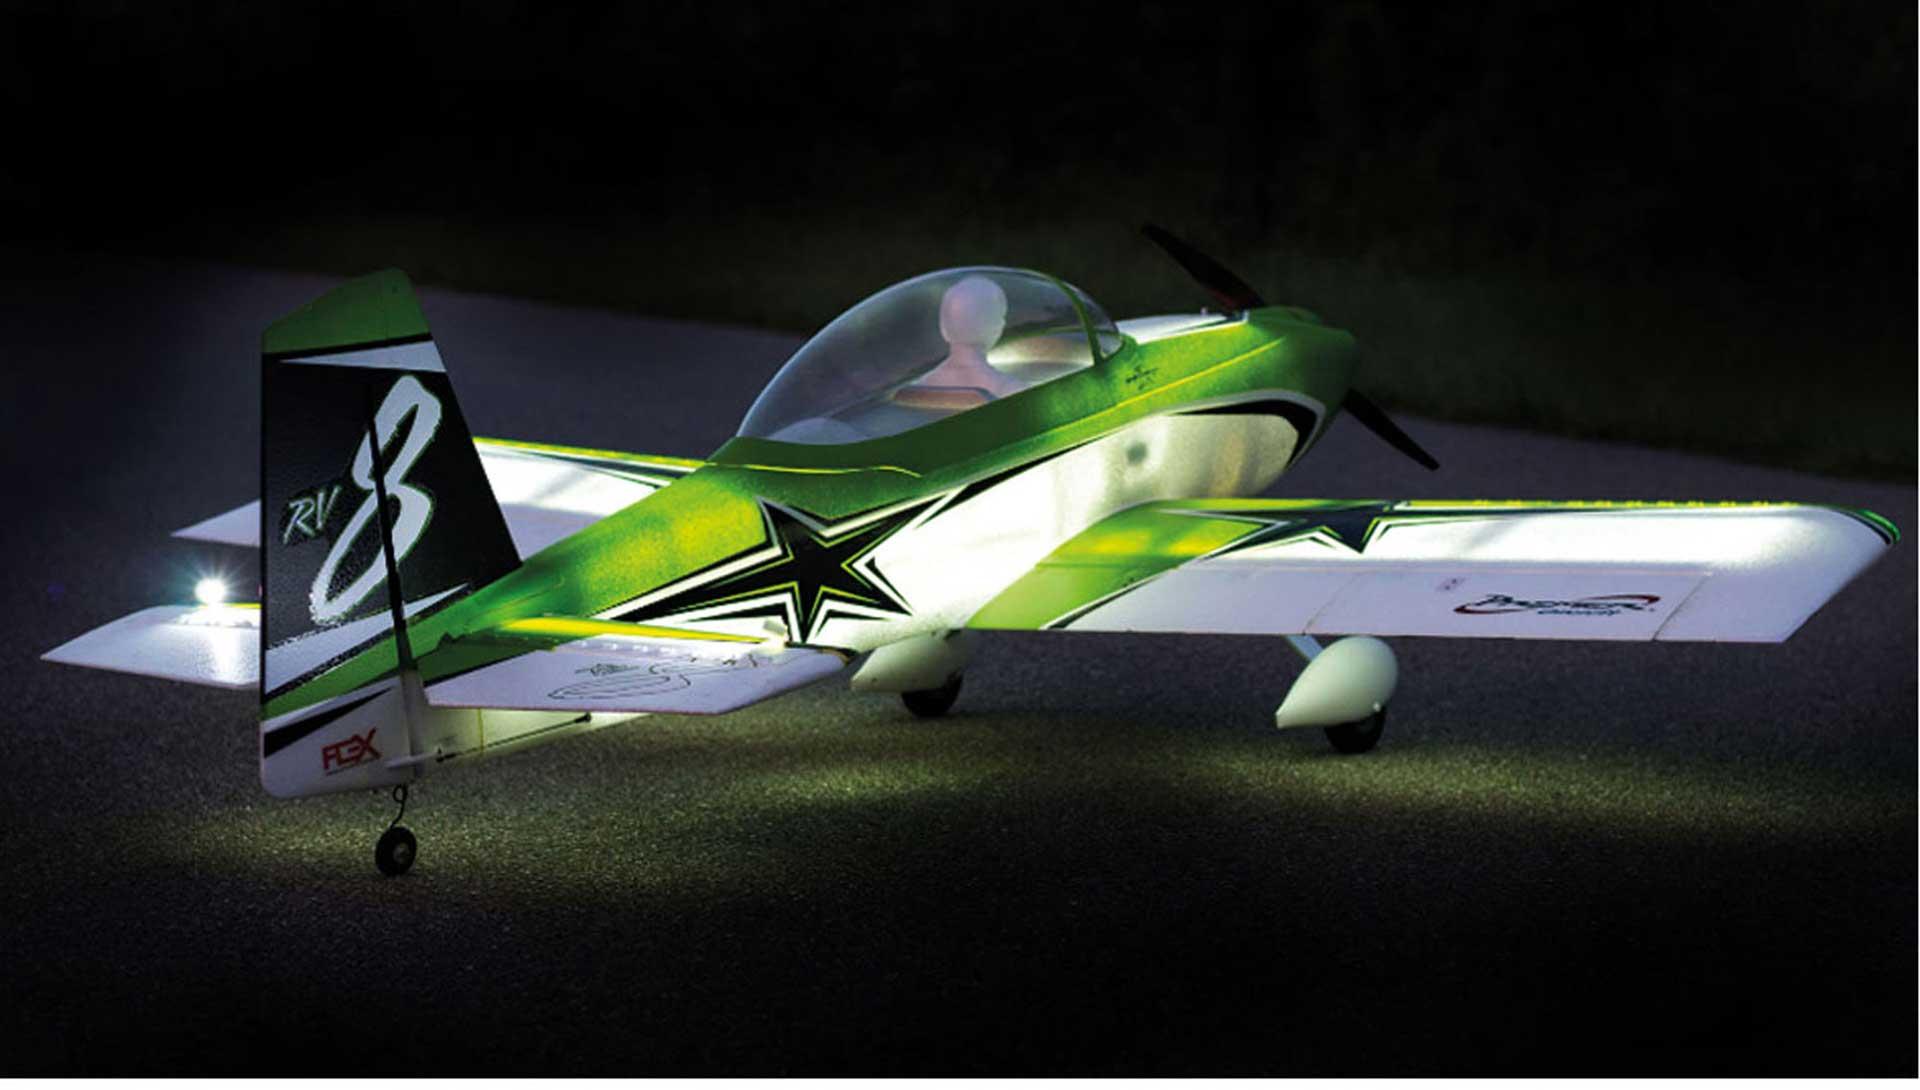 PREMIER AIRCRAFT RV-8 SUPER PNP NIGHT WITH AURA 8 AND NIGHT FLIGHT ILLUMINATION